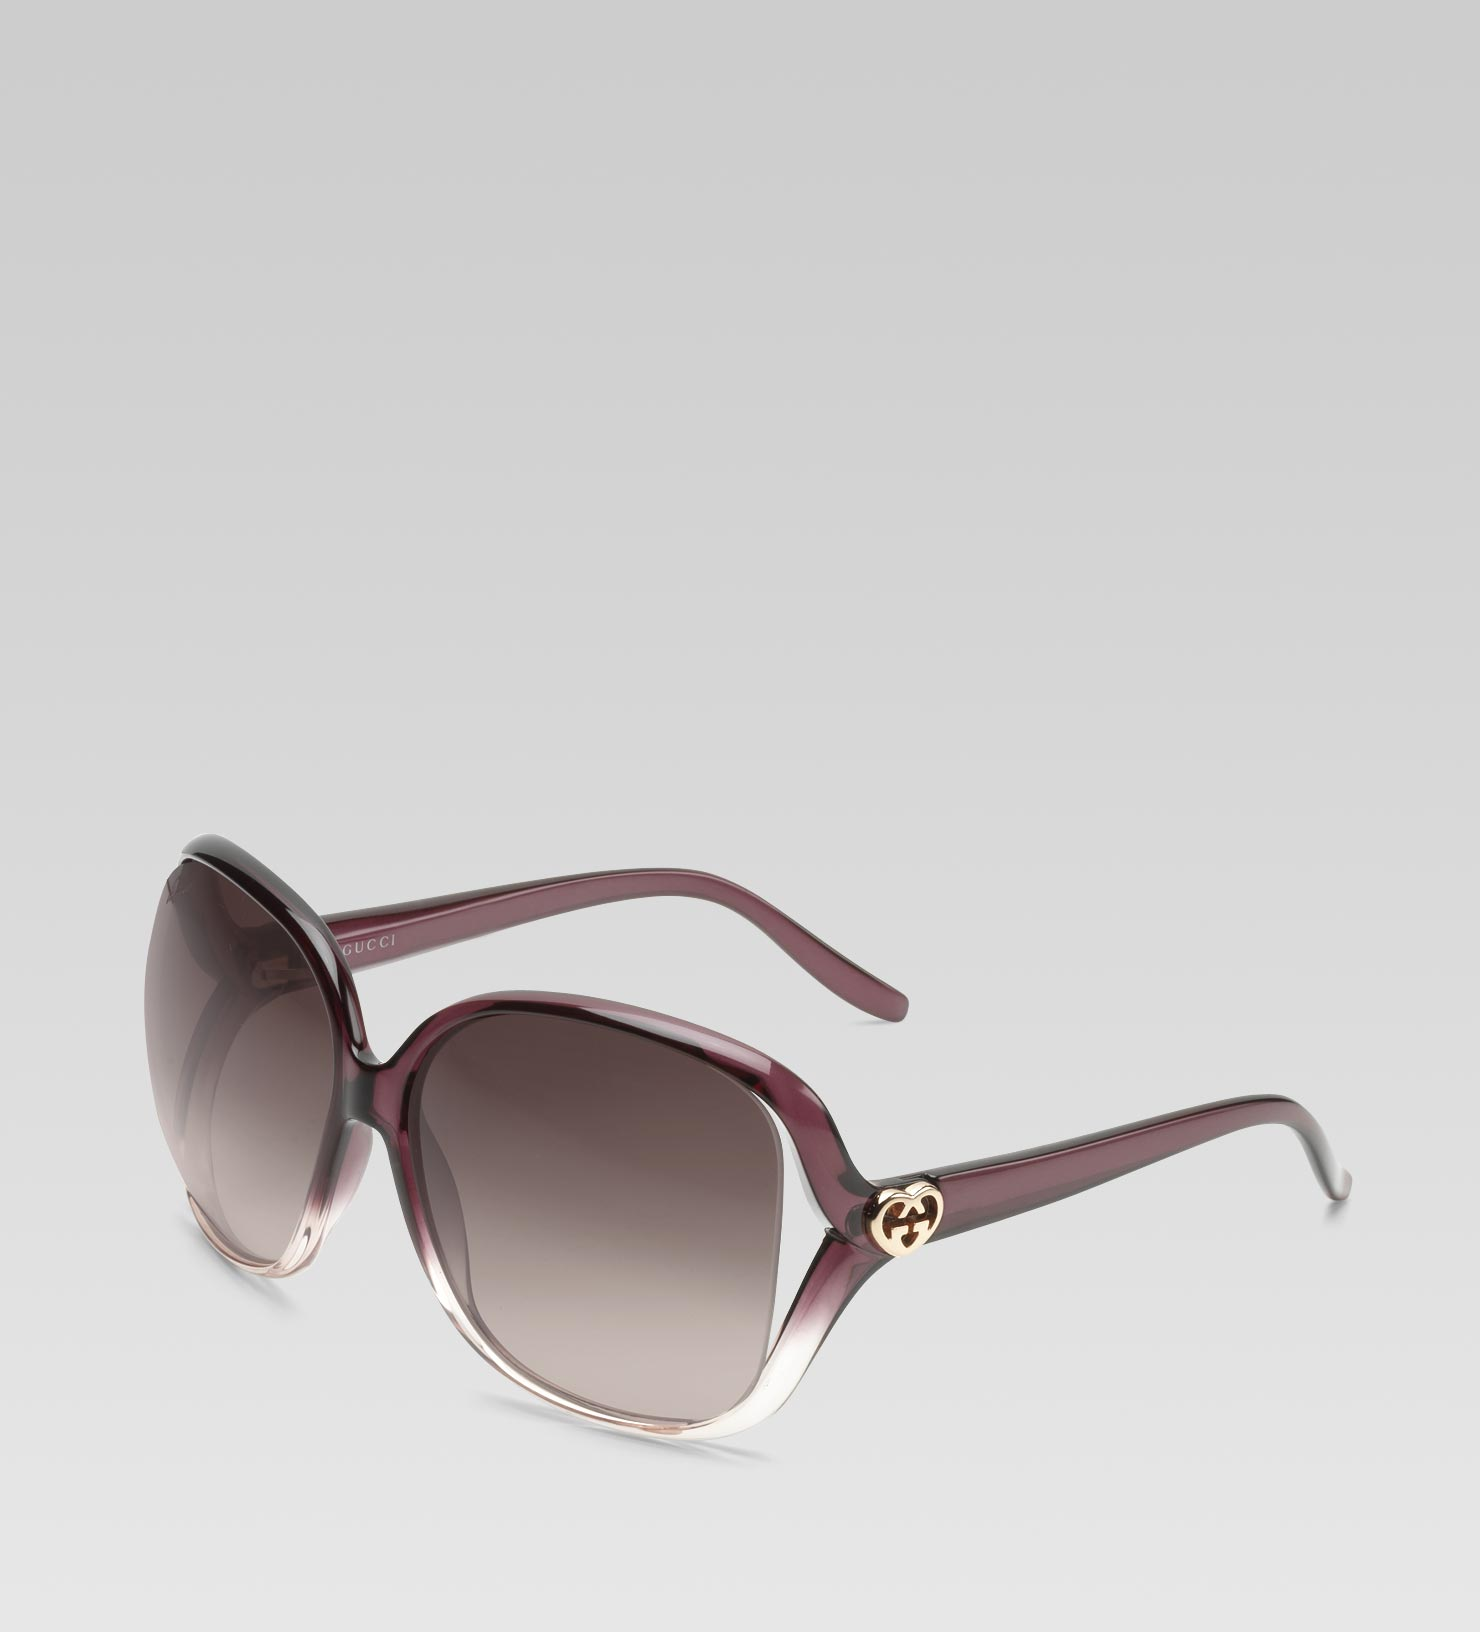 e4a2d44880ce1 Gucci Medium Square Frame Sunglasses With Heart-shaped Interlocking ...